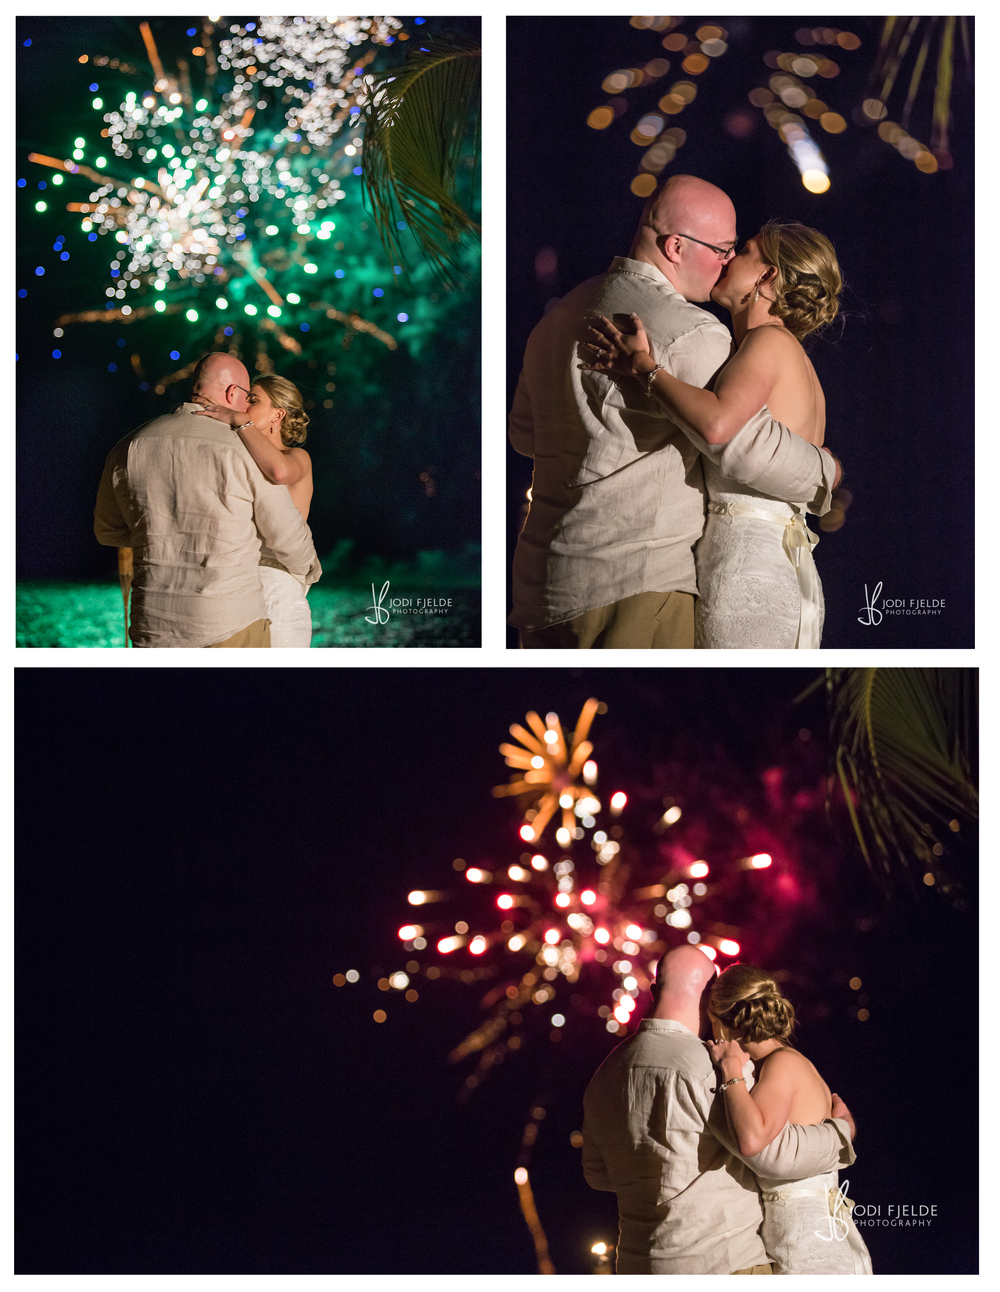 Cocconut_Cove_&_ Marina_ wedding_Kayla_and_Patrick 33.jpg